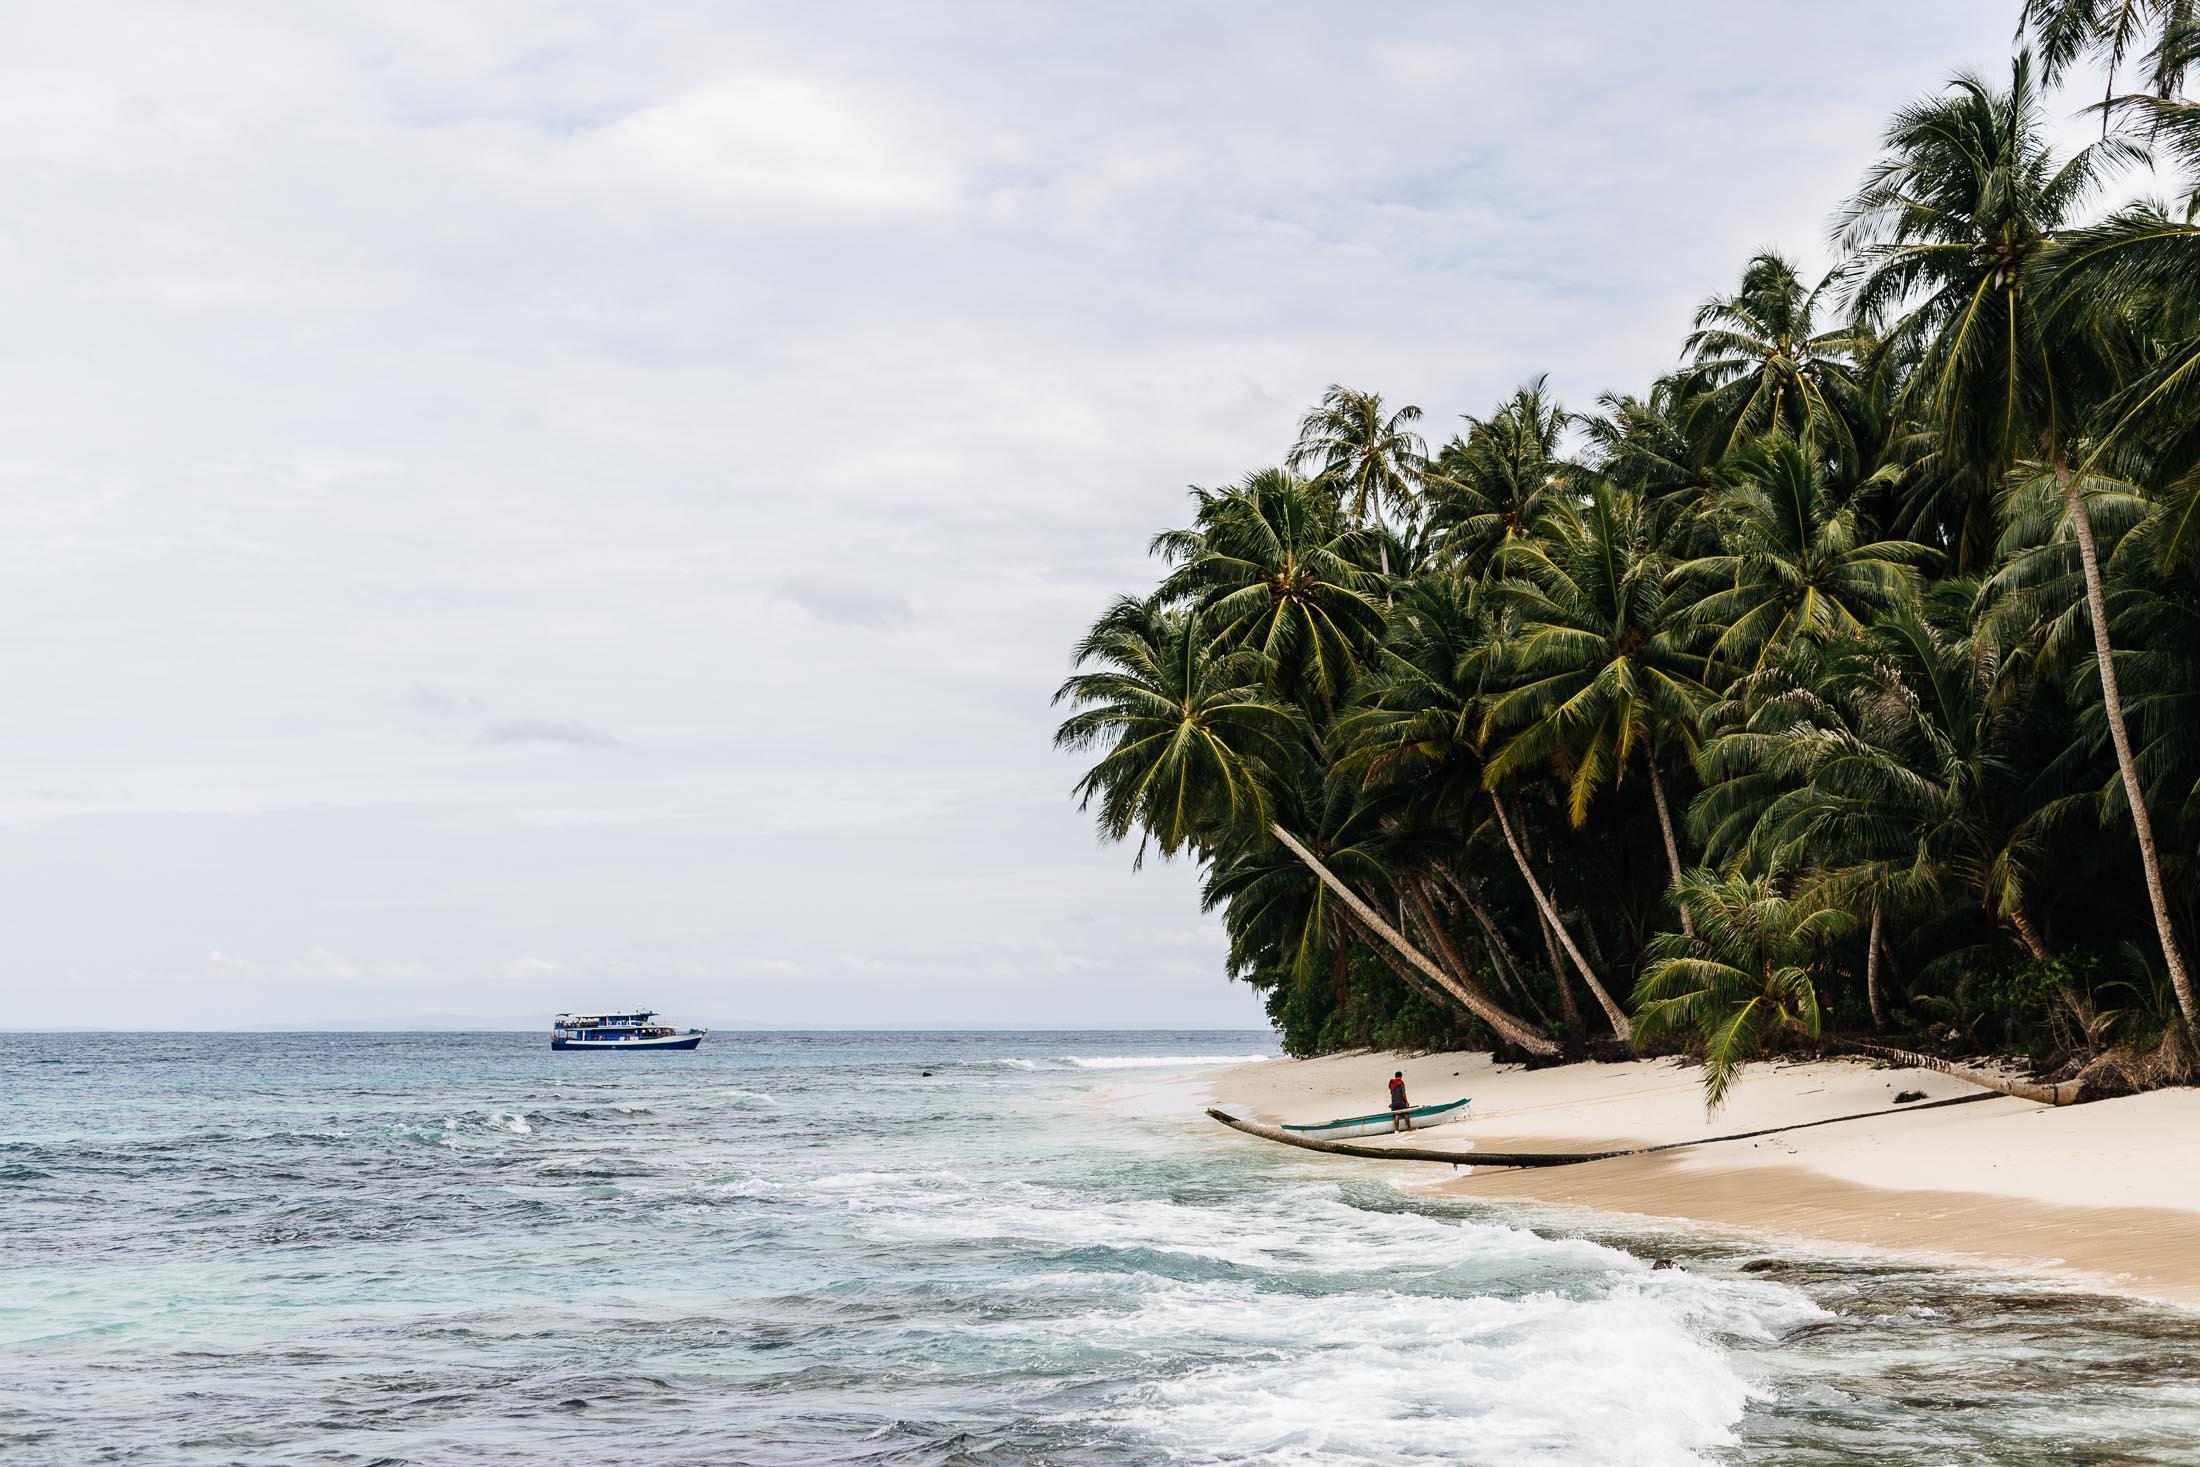 TELO ISLANDS 14